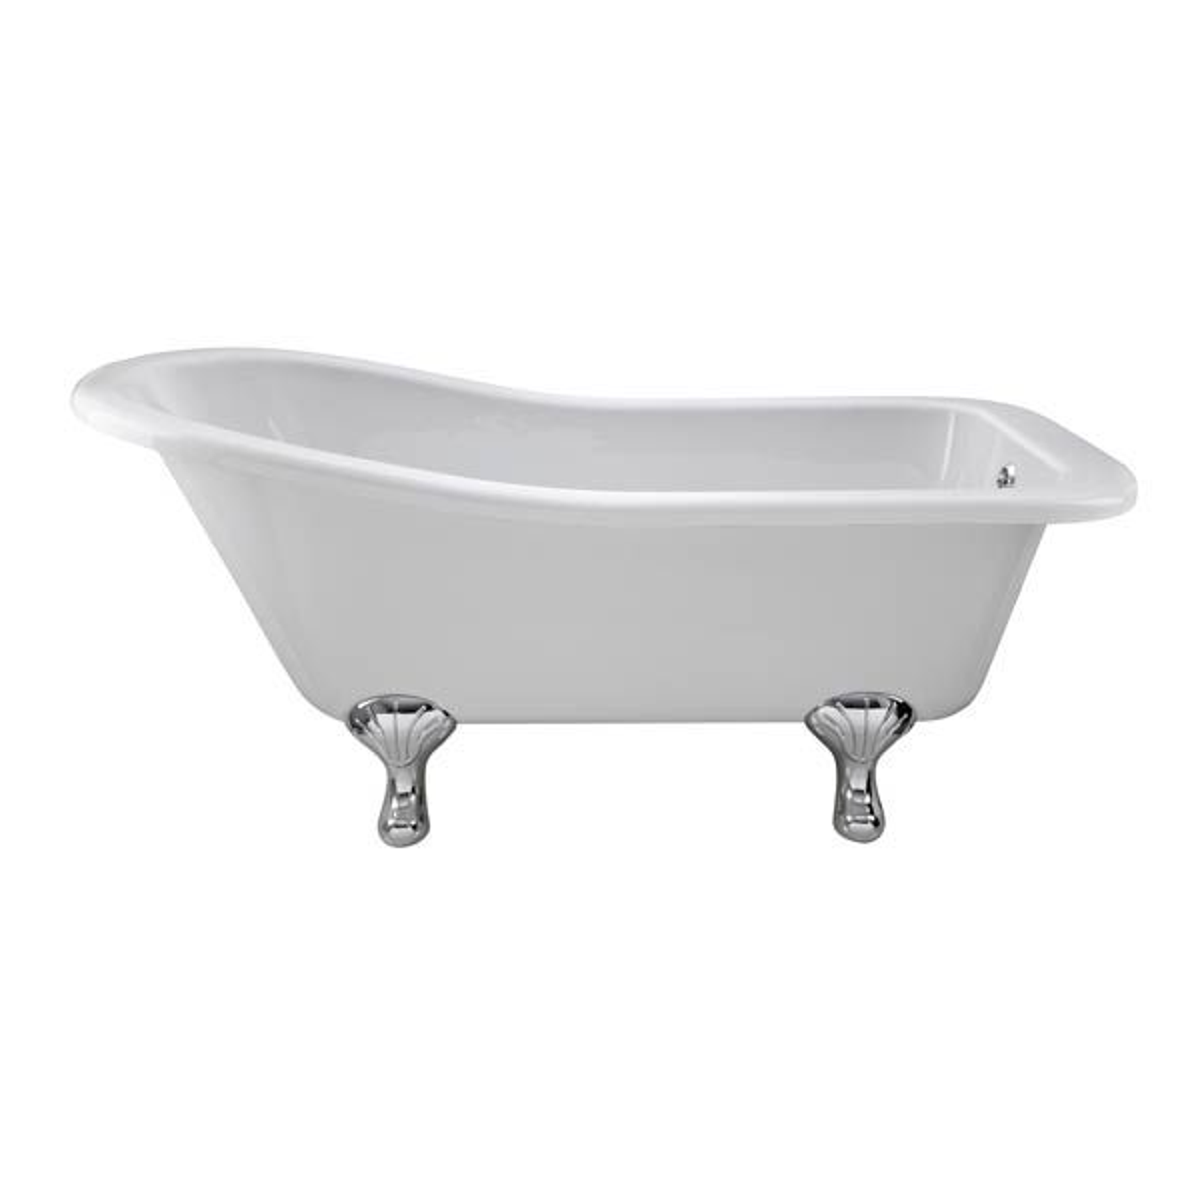 Premier Kensington Freestanding Slipper Bath with Corbel Leg Set